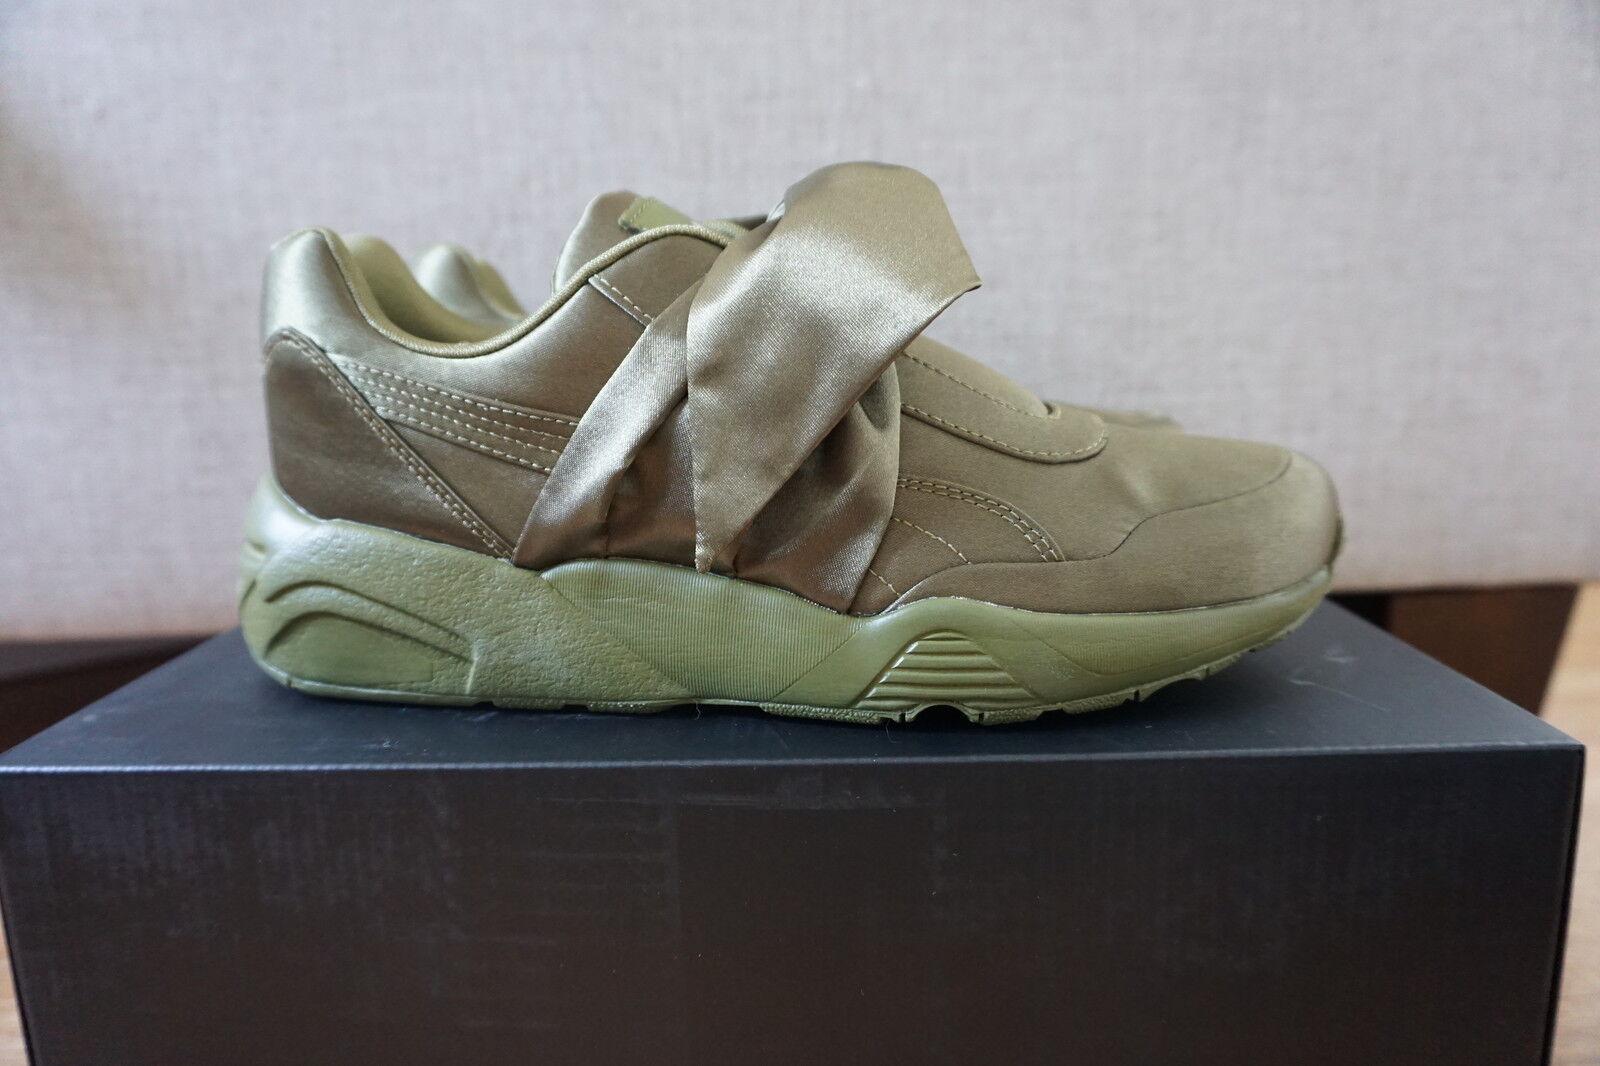 Puma 4 X Rihanna Fenty Bow Sneaker Olive UK3 3.5 4 Puma 4.5 5 5.5 6 468a92